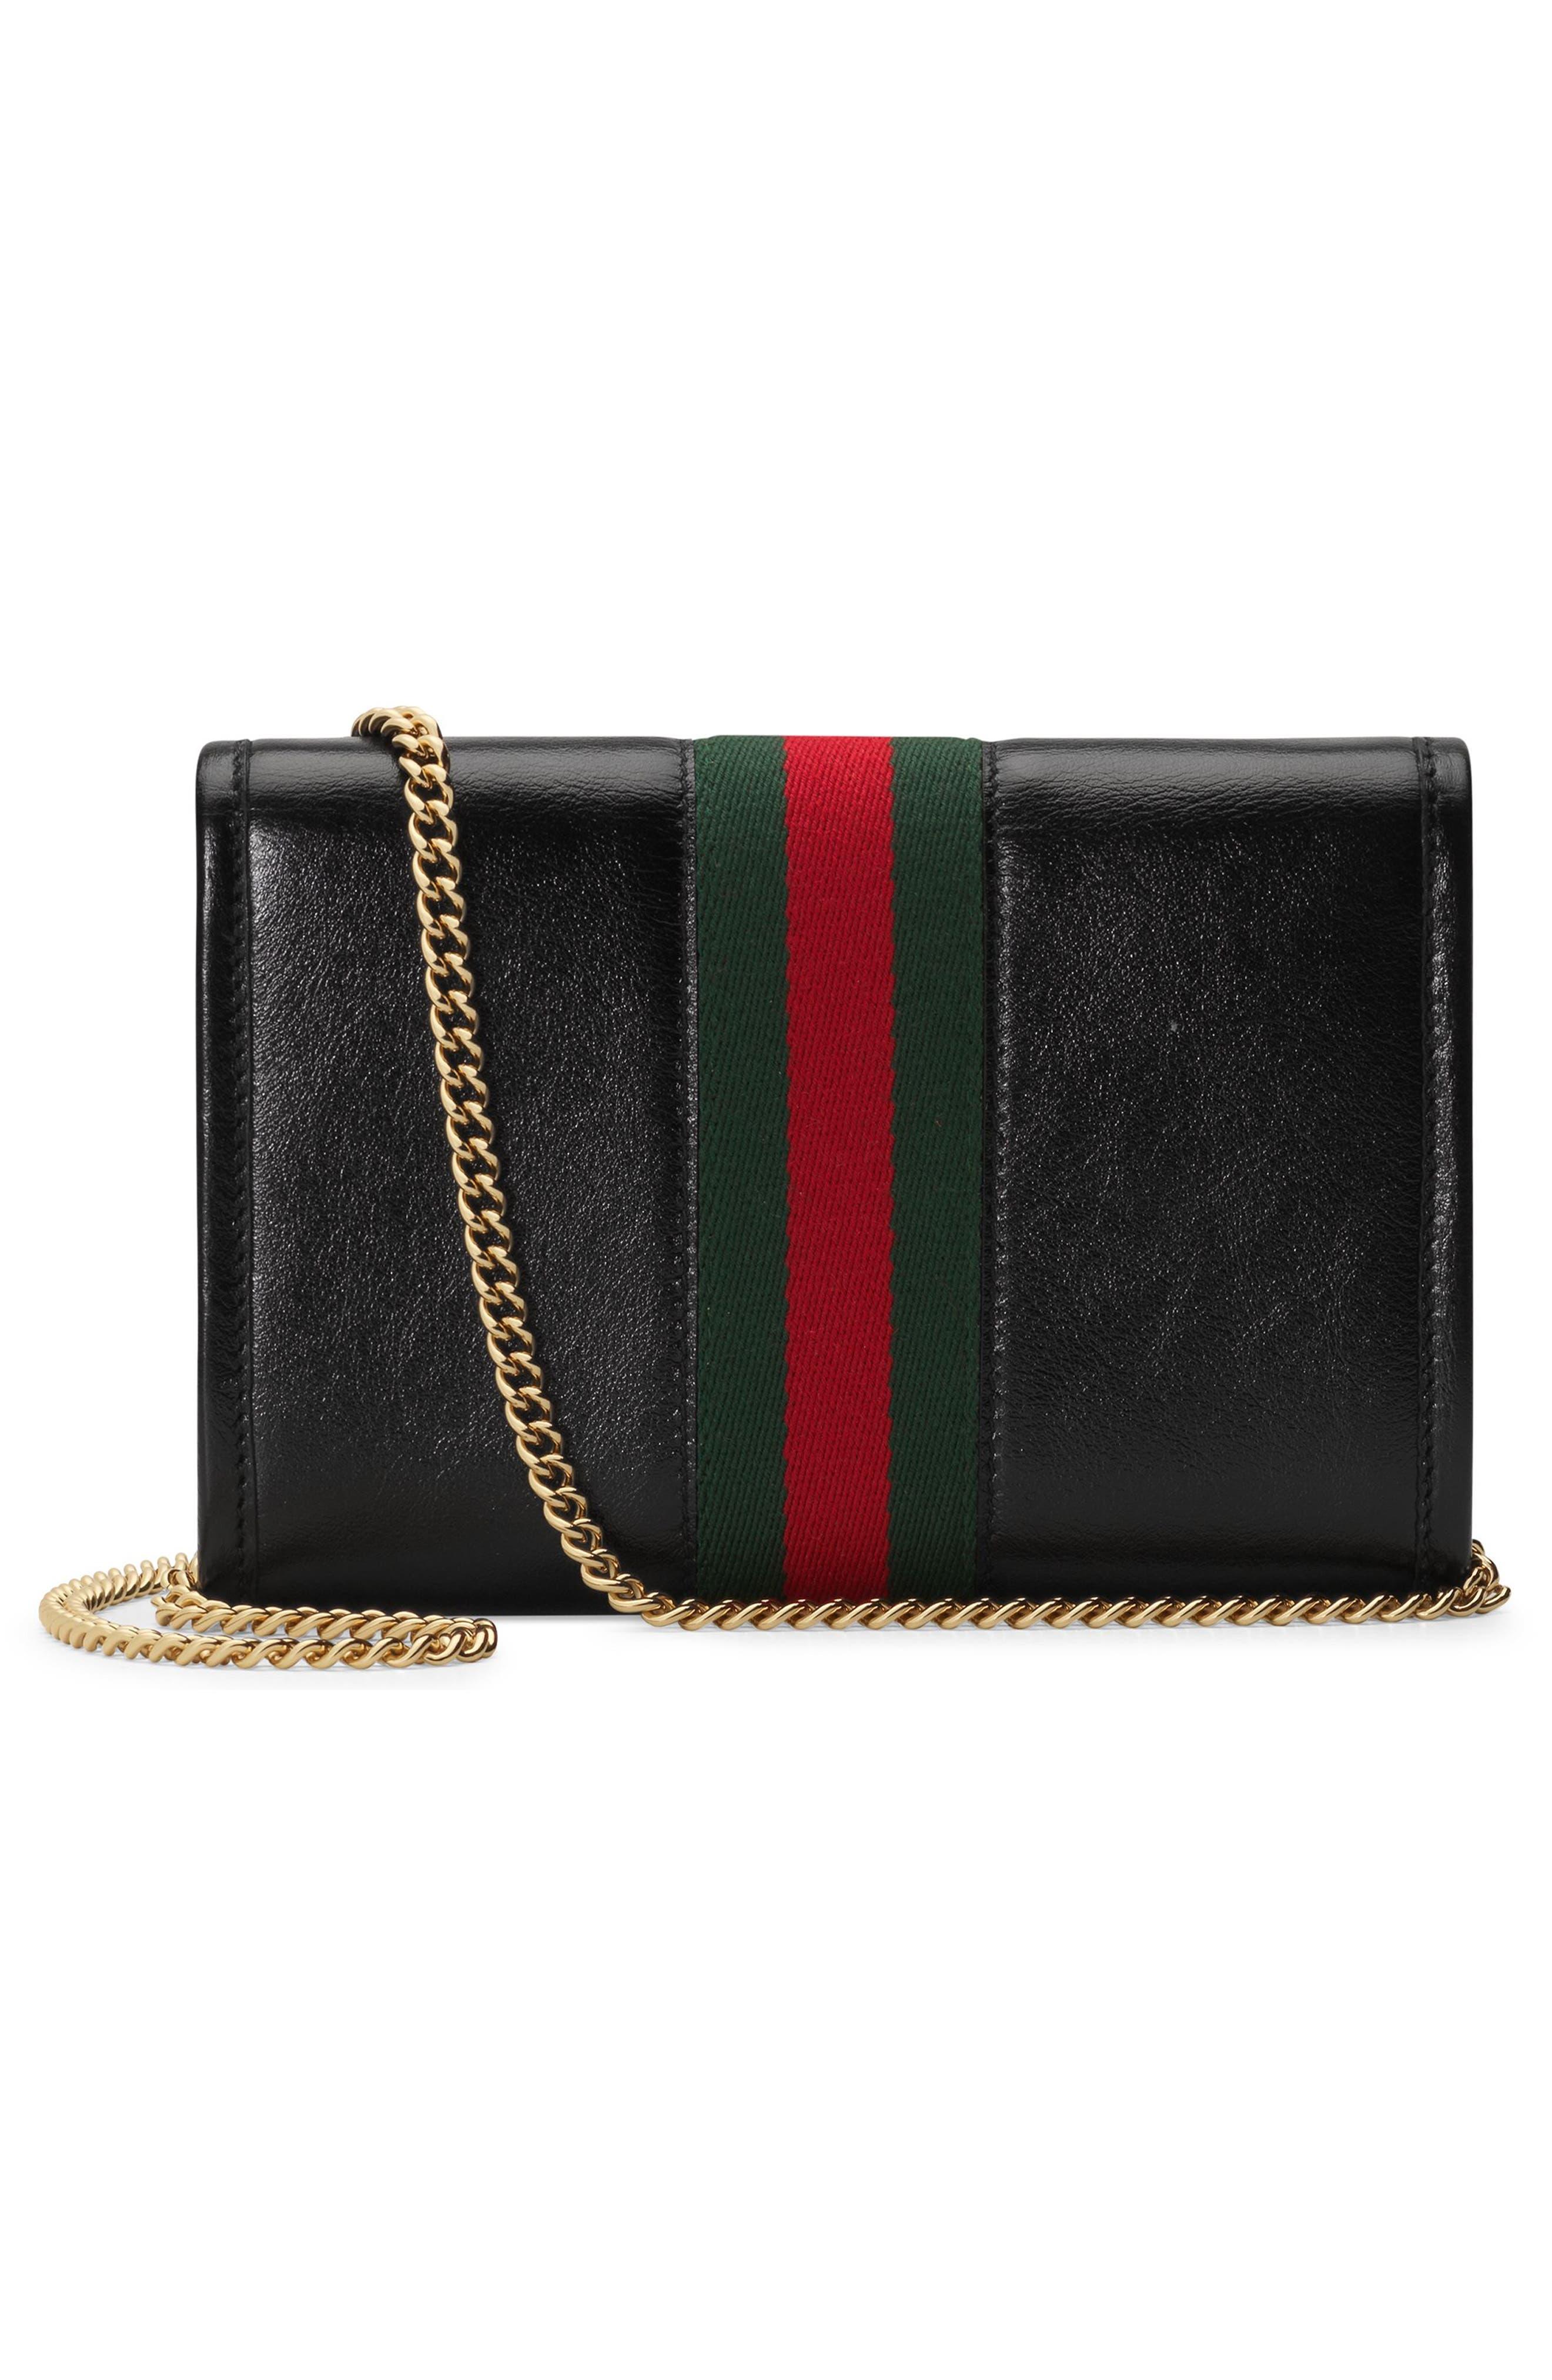 ,                             Mini Rajah Leather Crossbody Bag,                             Alternate thumbnail 2, color,                             NERO/ VERT RED MULTI